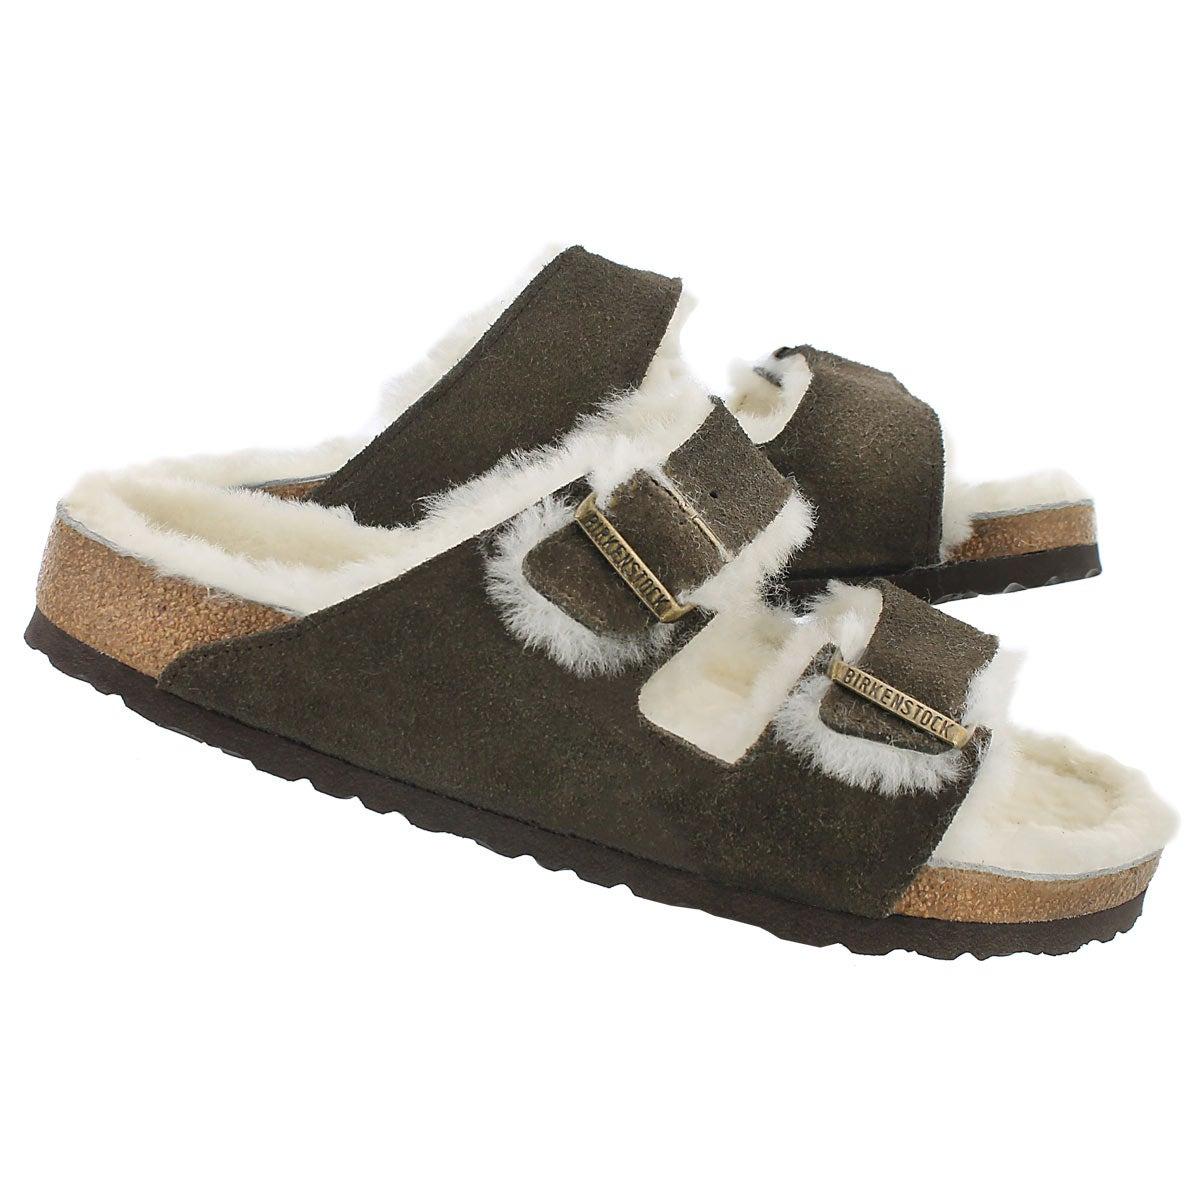 Mns ArizonaShearling mcha 2 strap sandal